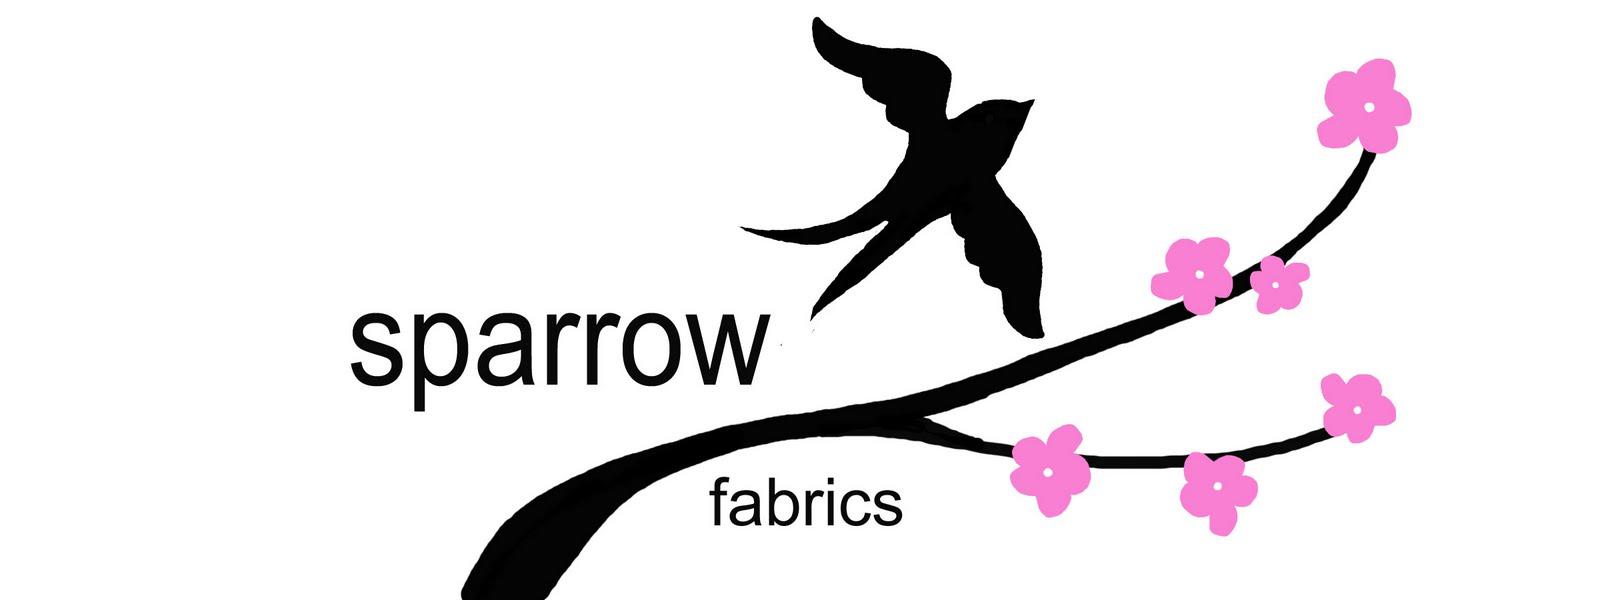 Sparrow Fabrics